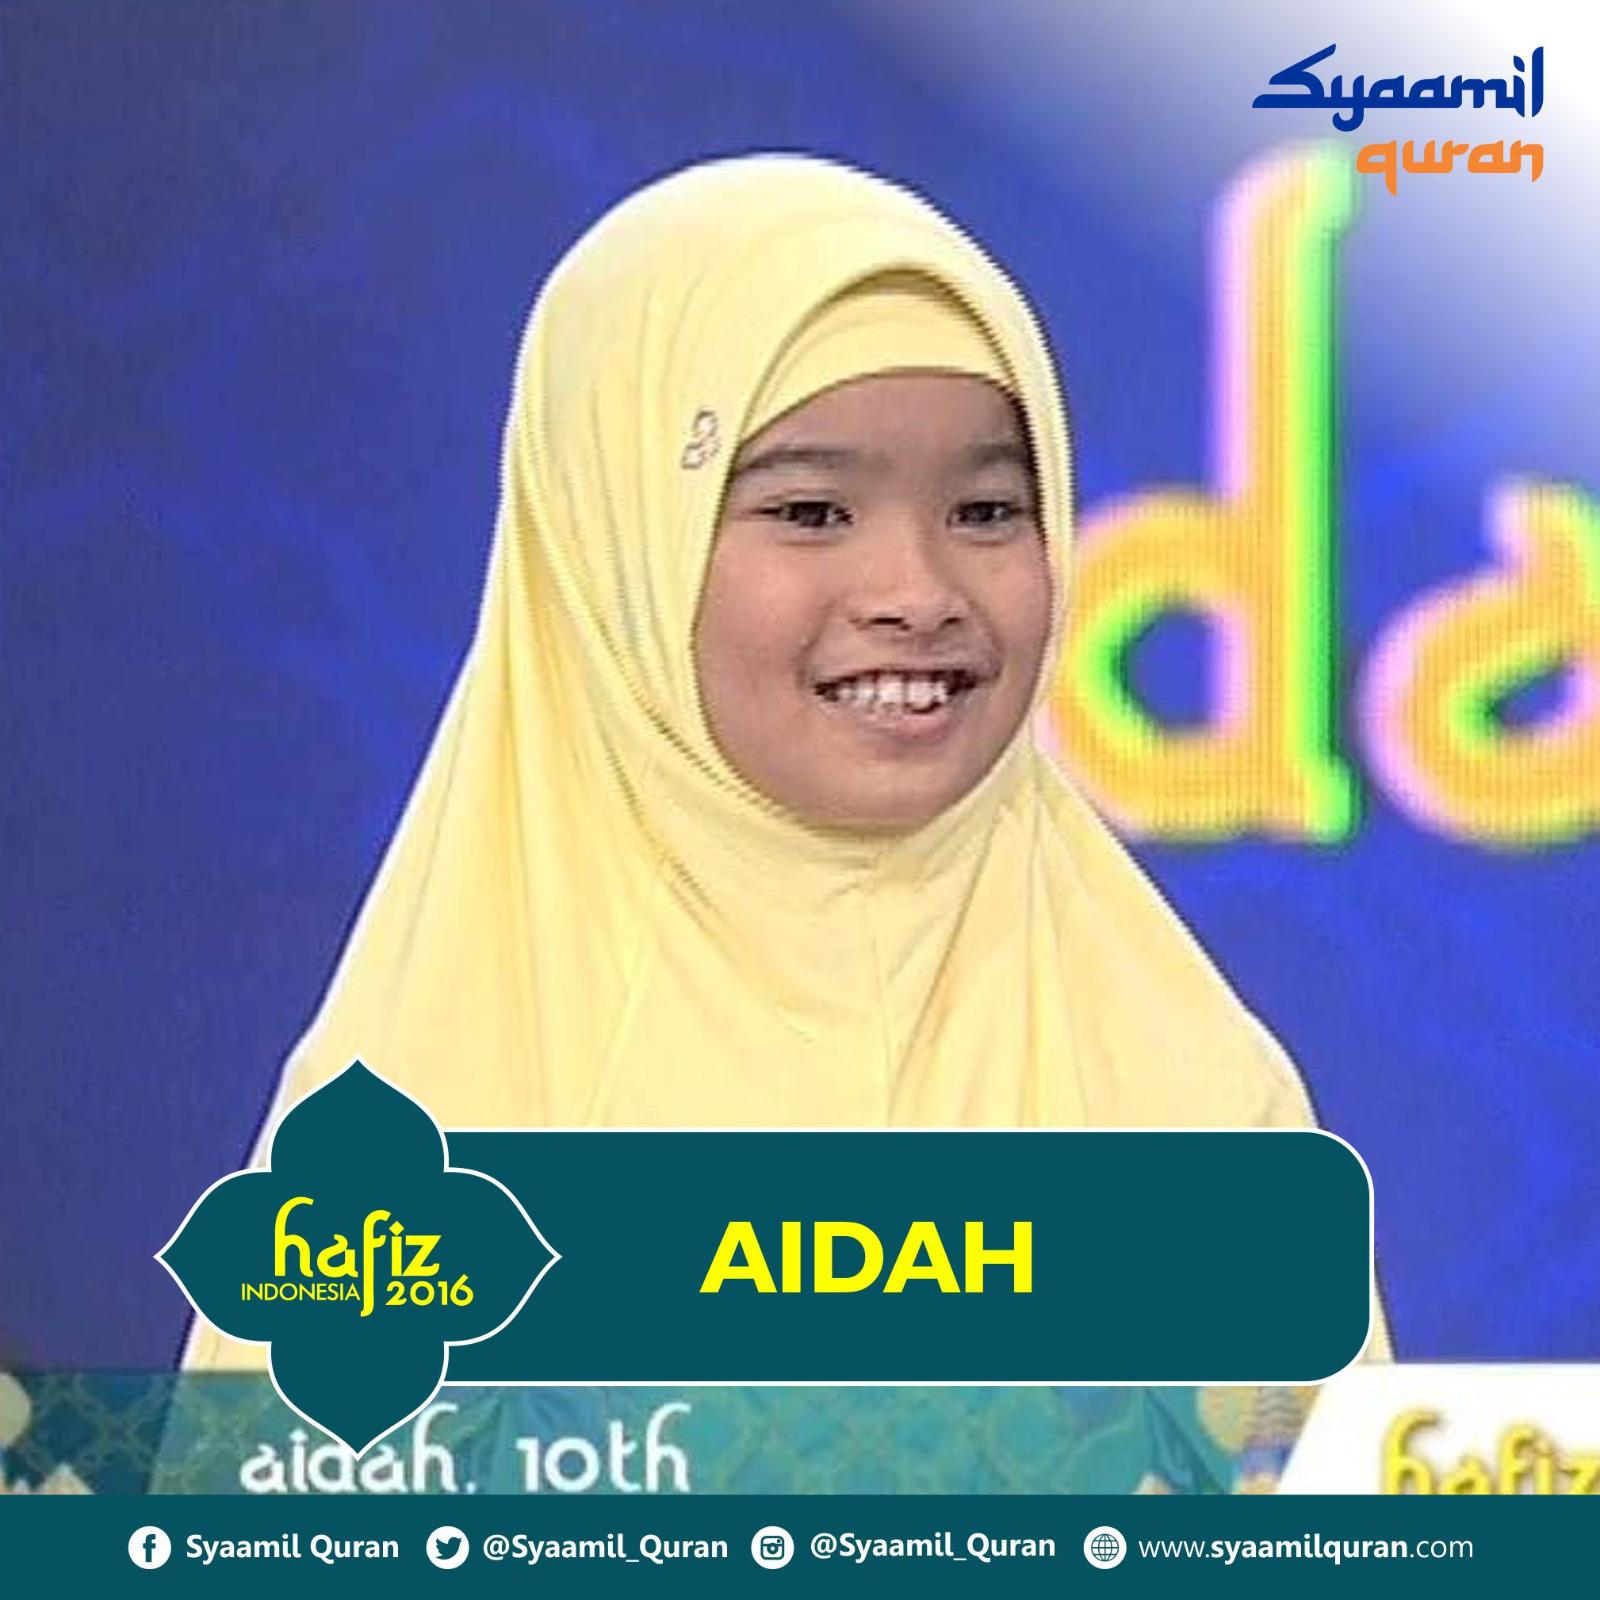 Aidah Hafiz Indonesia 2016